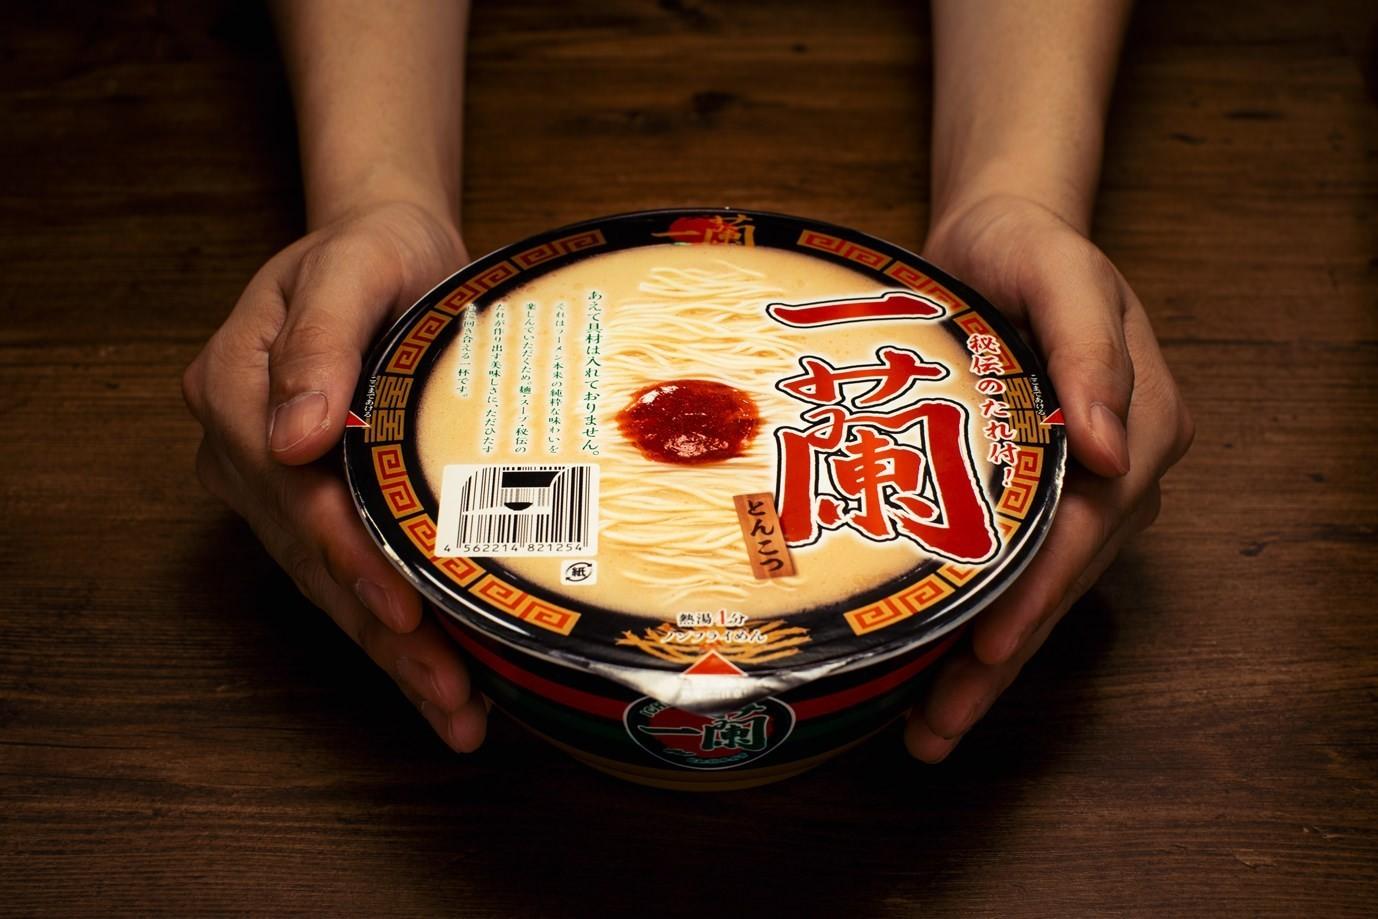 Ichiran releases an instant version of their ramen